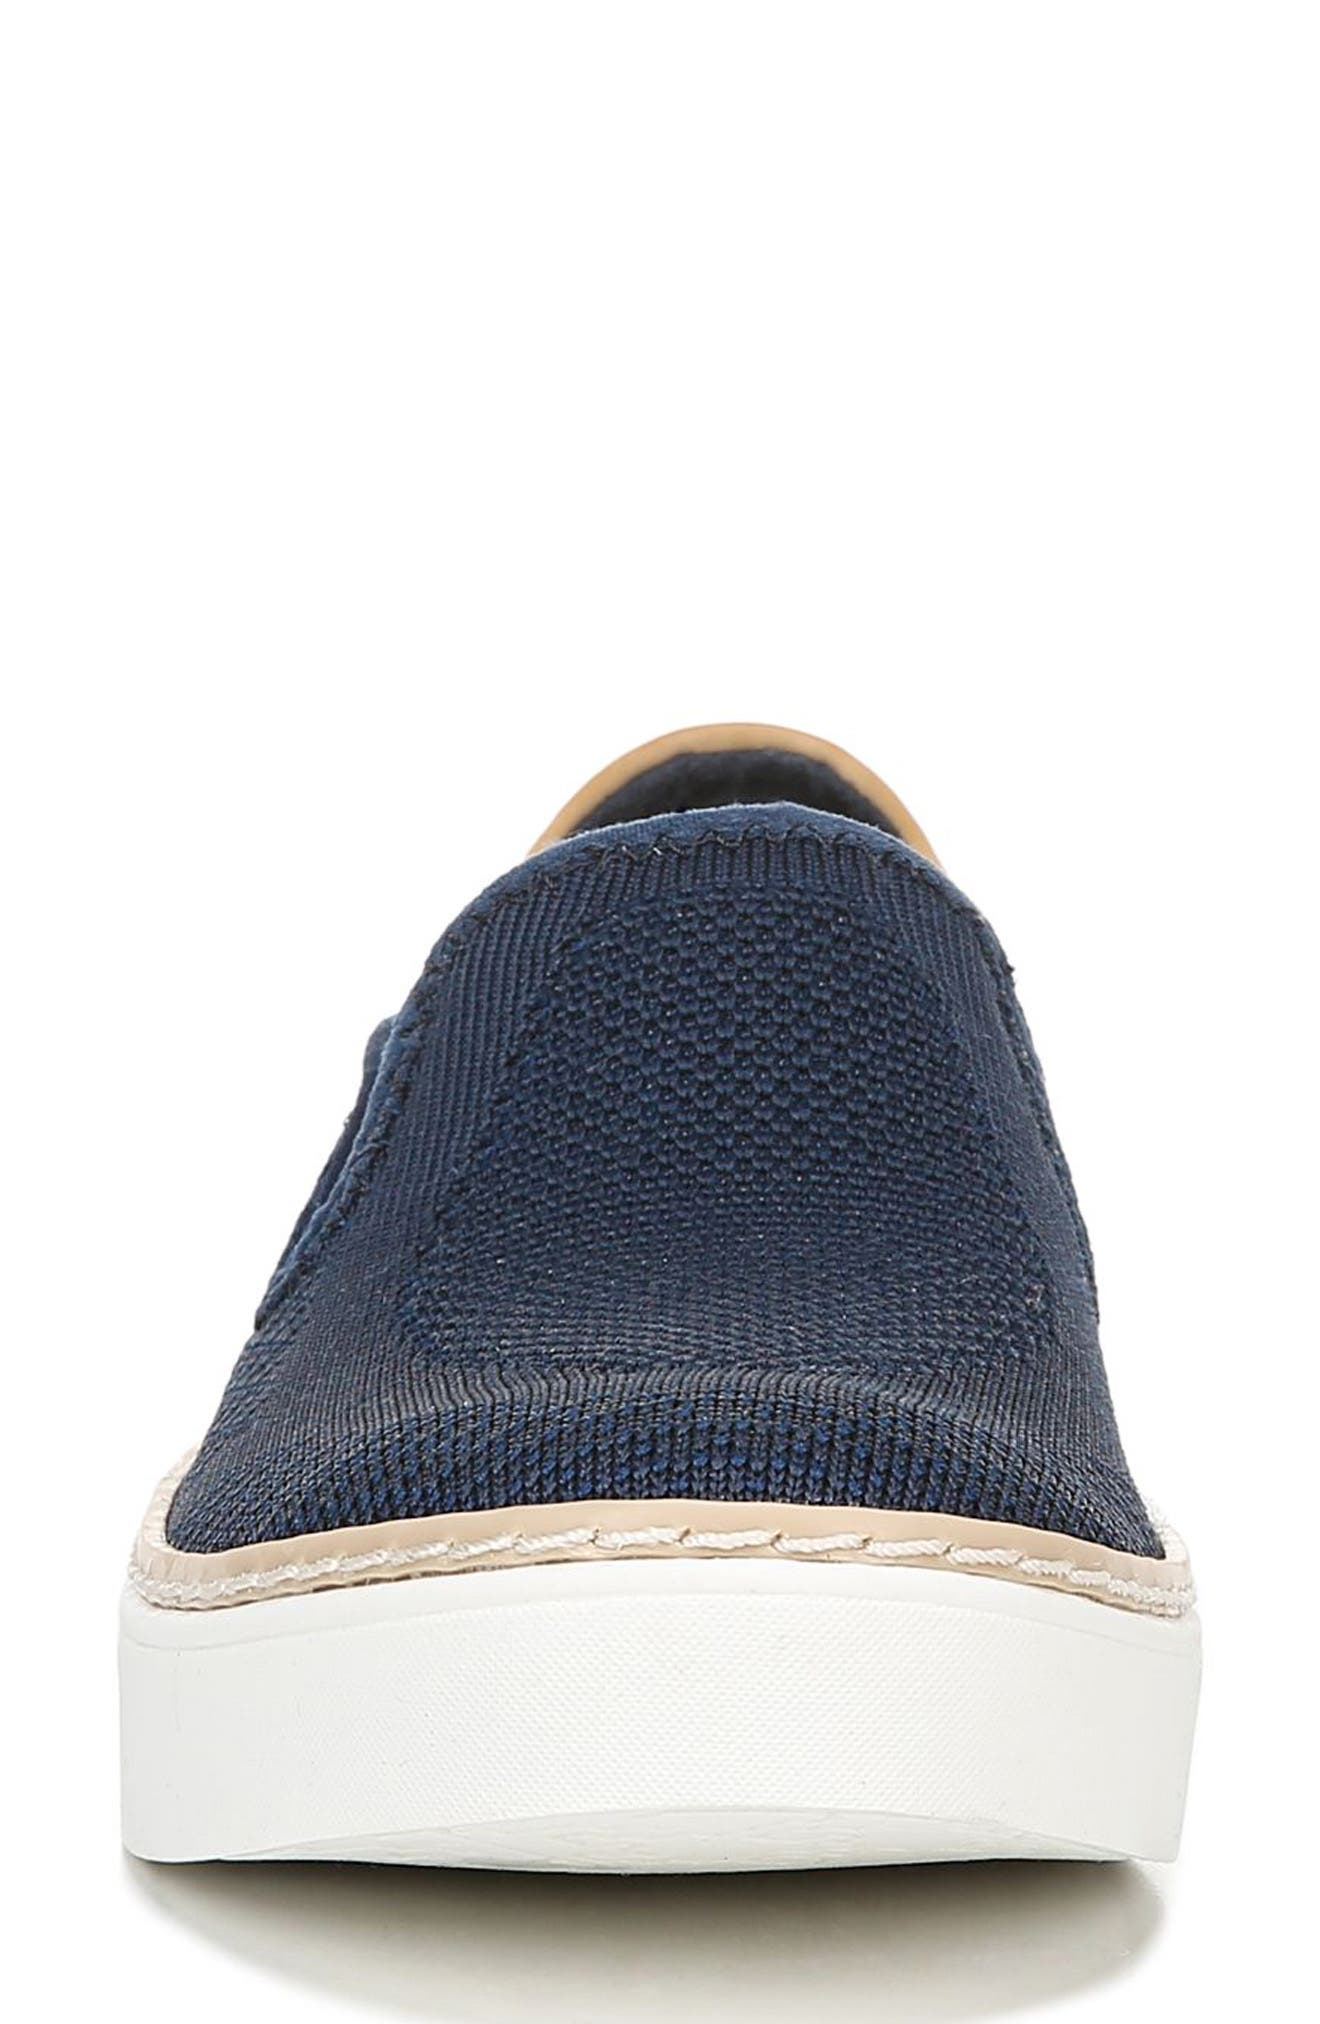 DR. SCHOLL'S, Madi Slip-On Sneaker, Alternate thumbnail 4, color, NAVY KNIT FABRIC